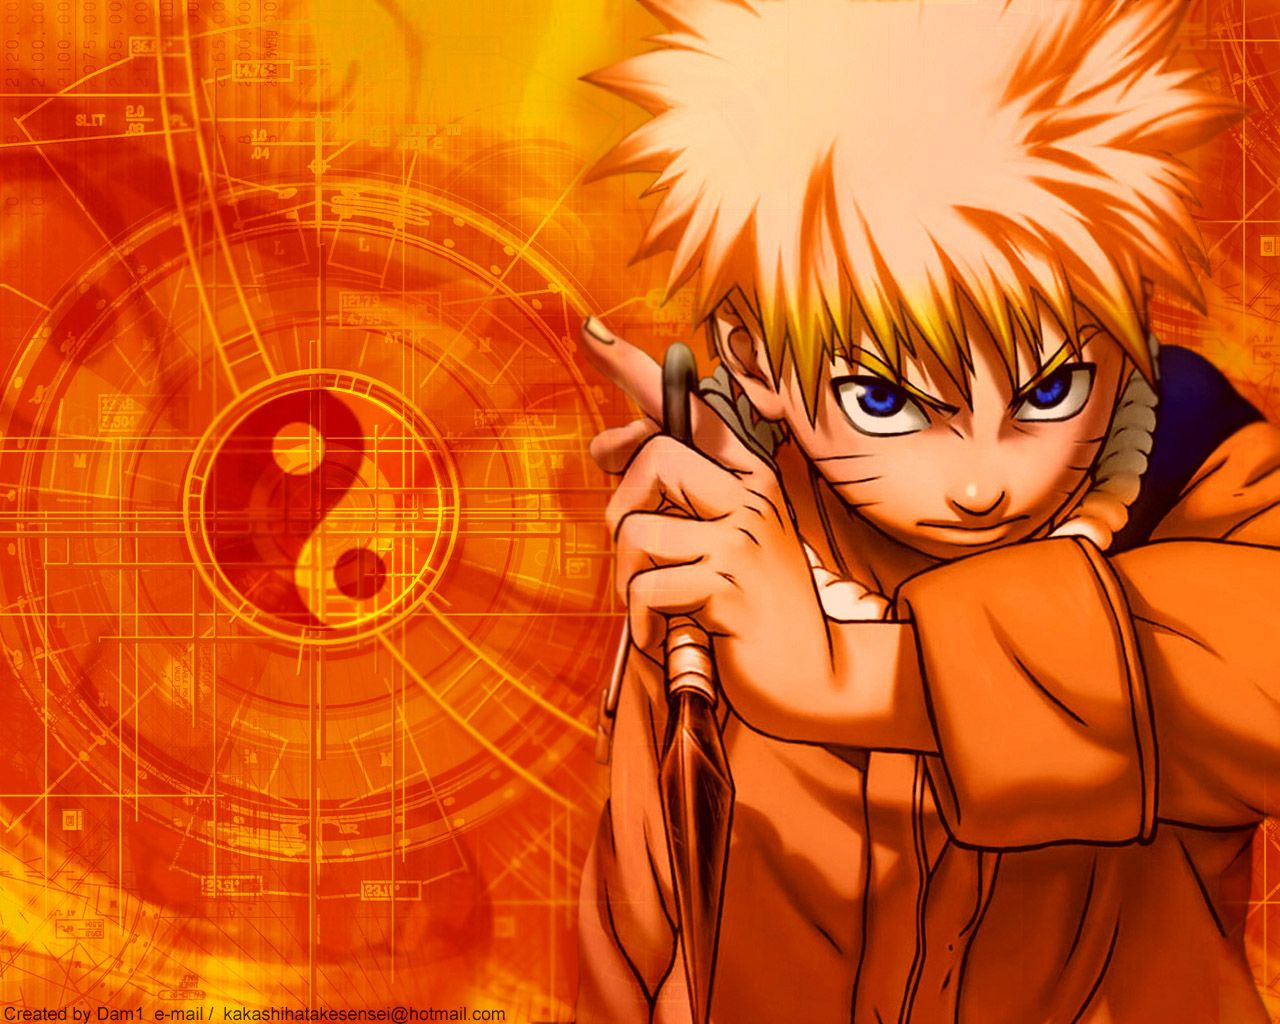 Fantastic Wallpaper Angry Naruto Uzumaki - 502183b32aea87dc98f02b26819af754  Gallery_811940      .jpg